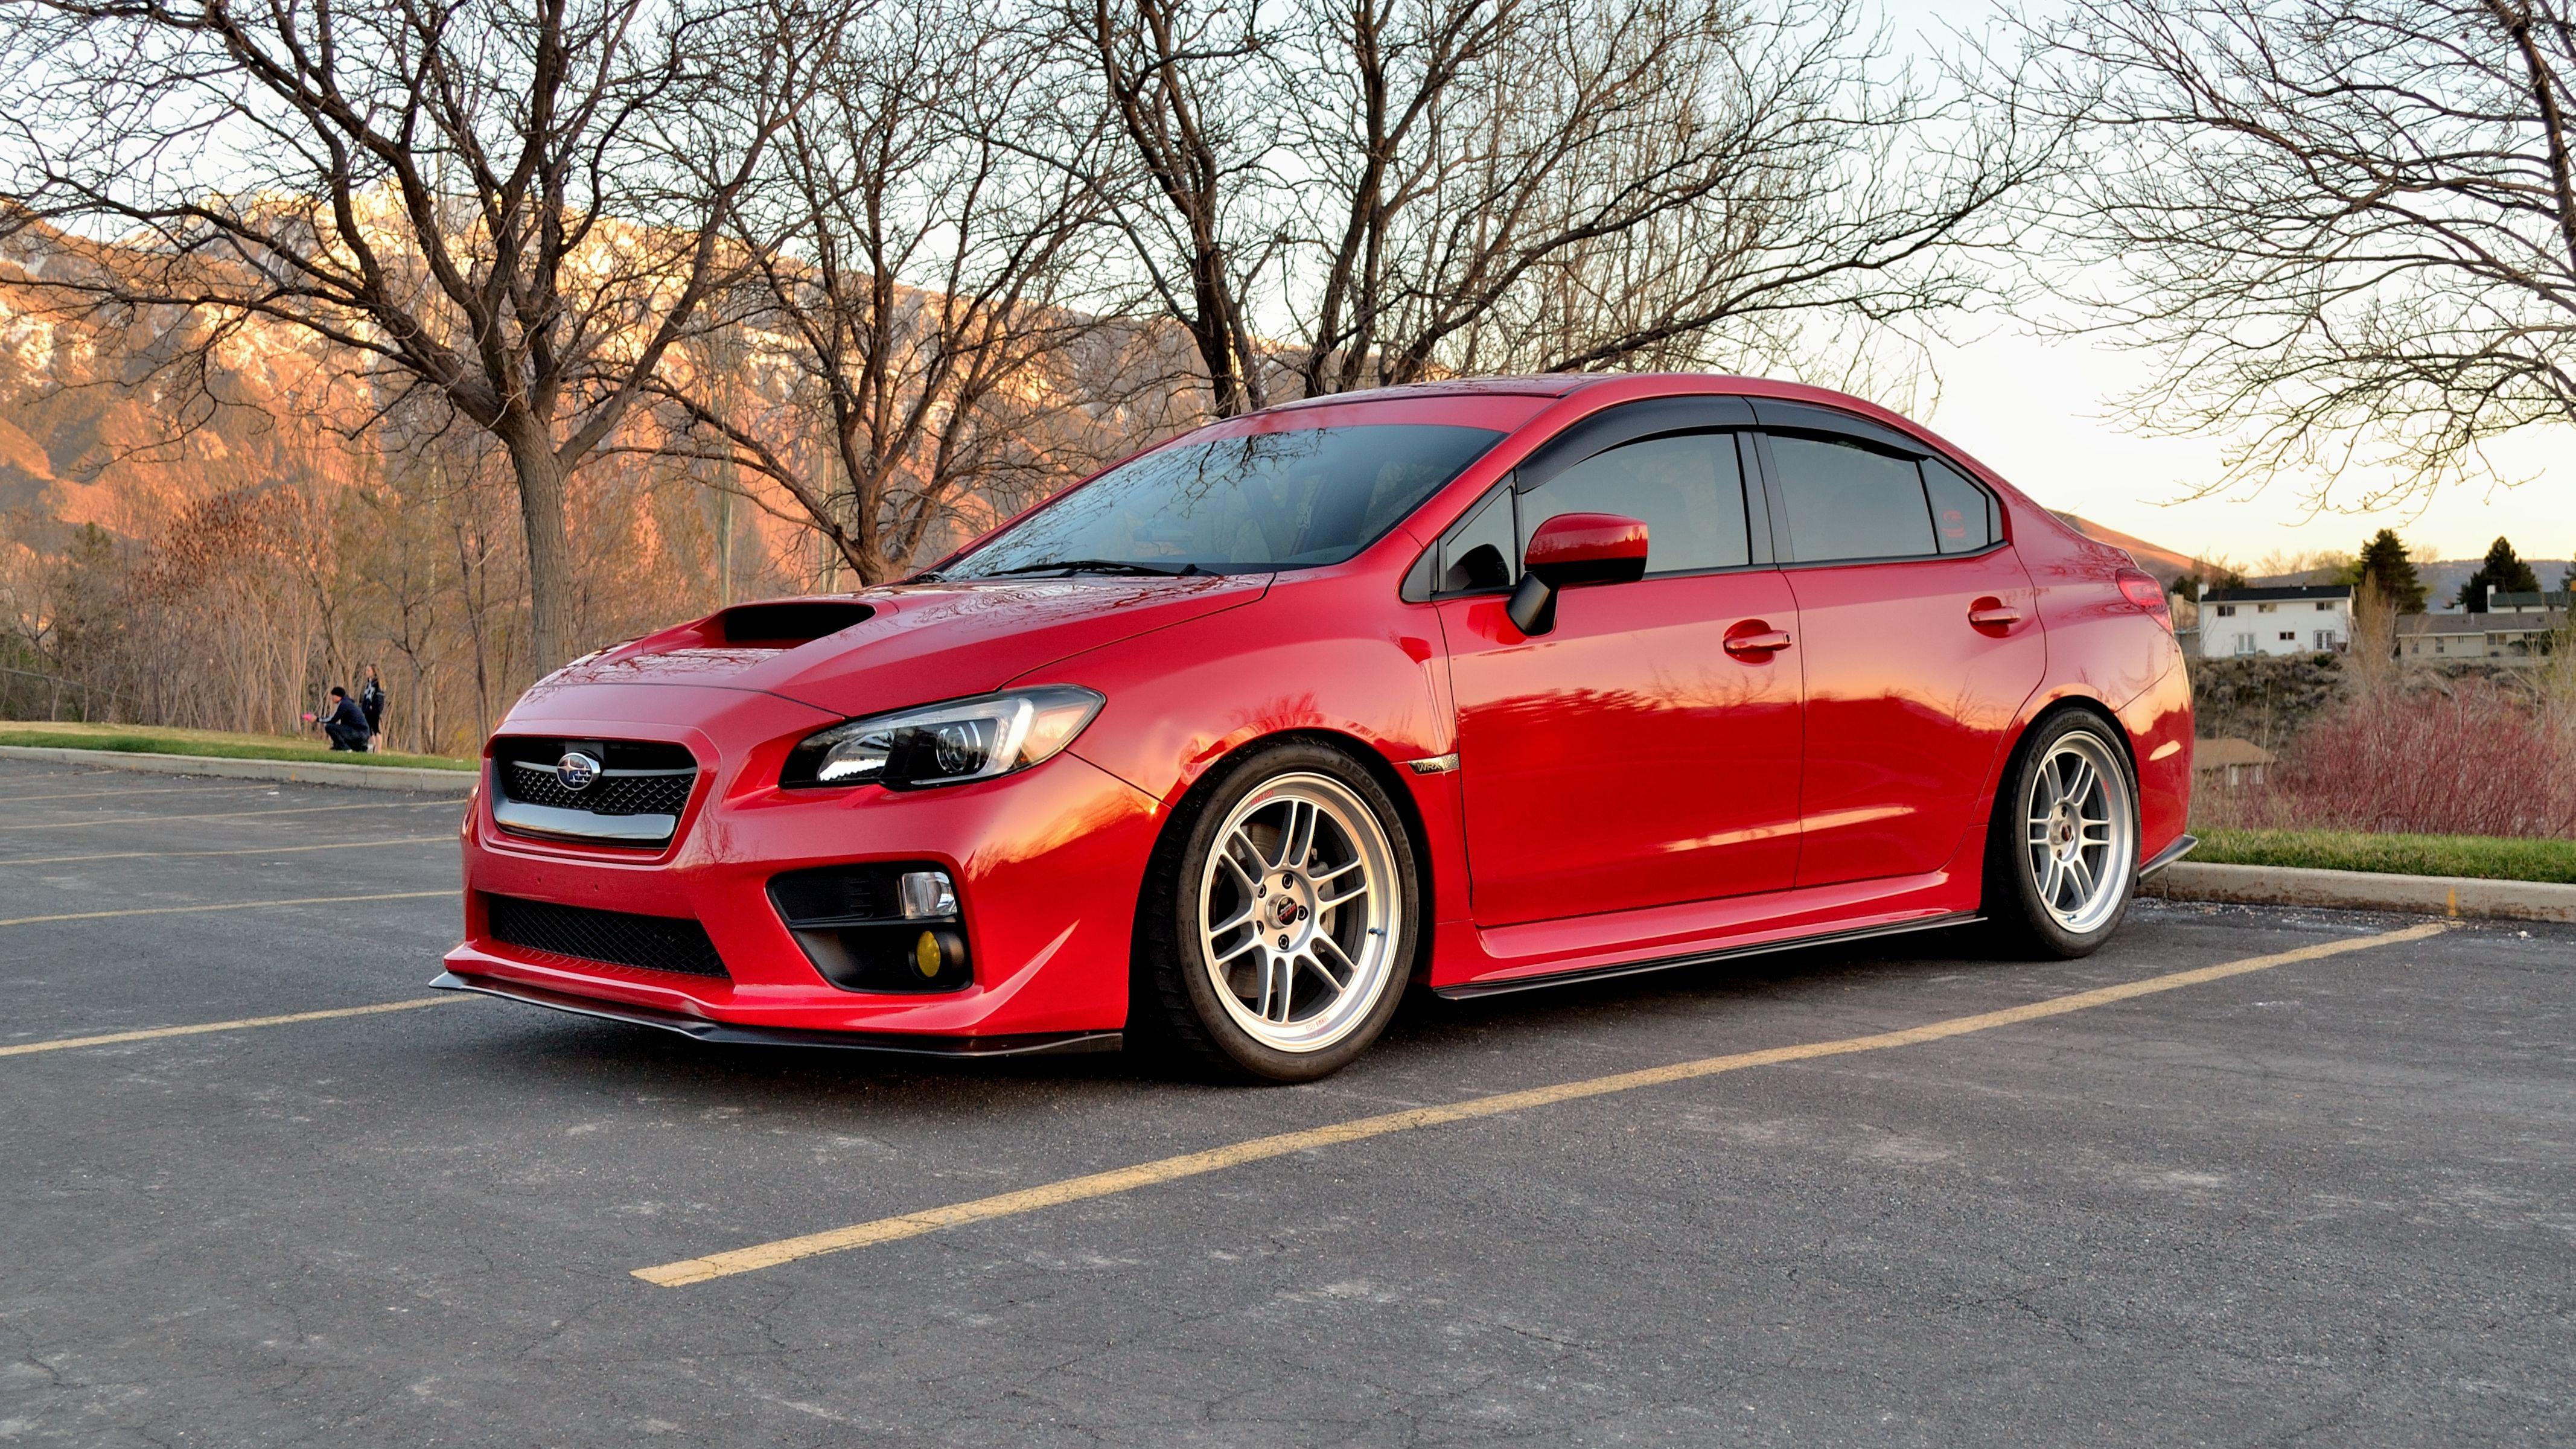 subaru wrx 2016 red. 2015 subaru wrx hard parker ht autos lip kit added lightning red sashawrx wrx 2016